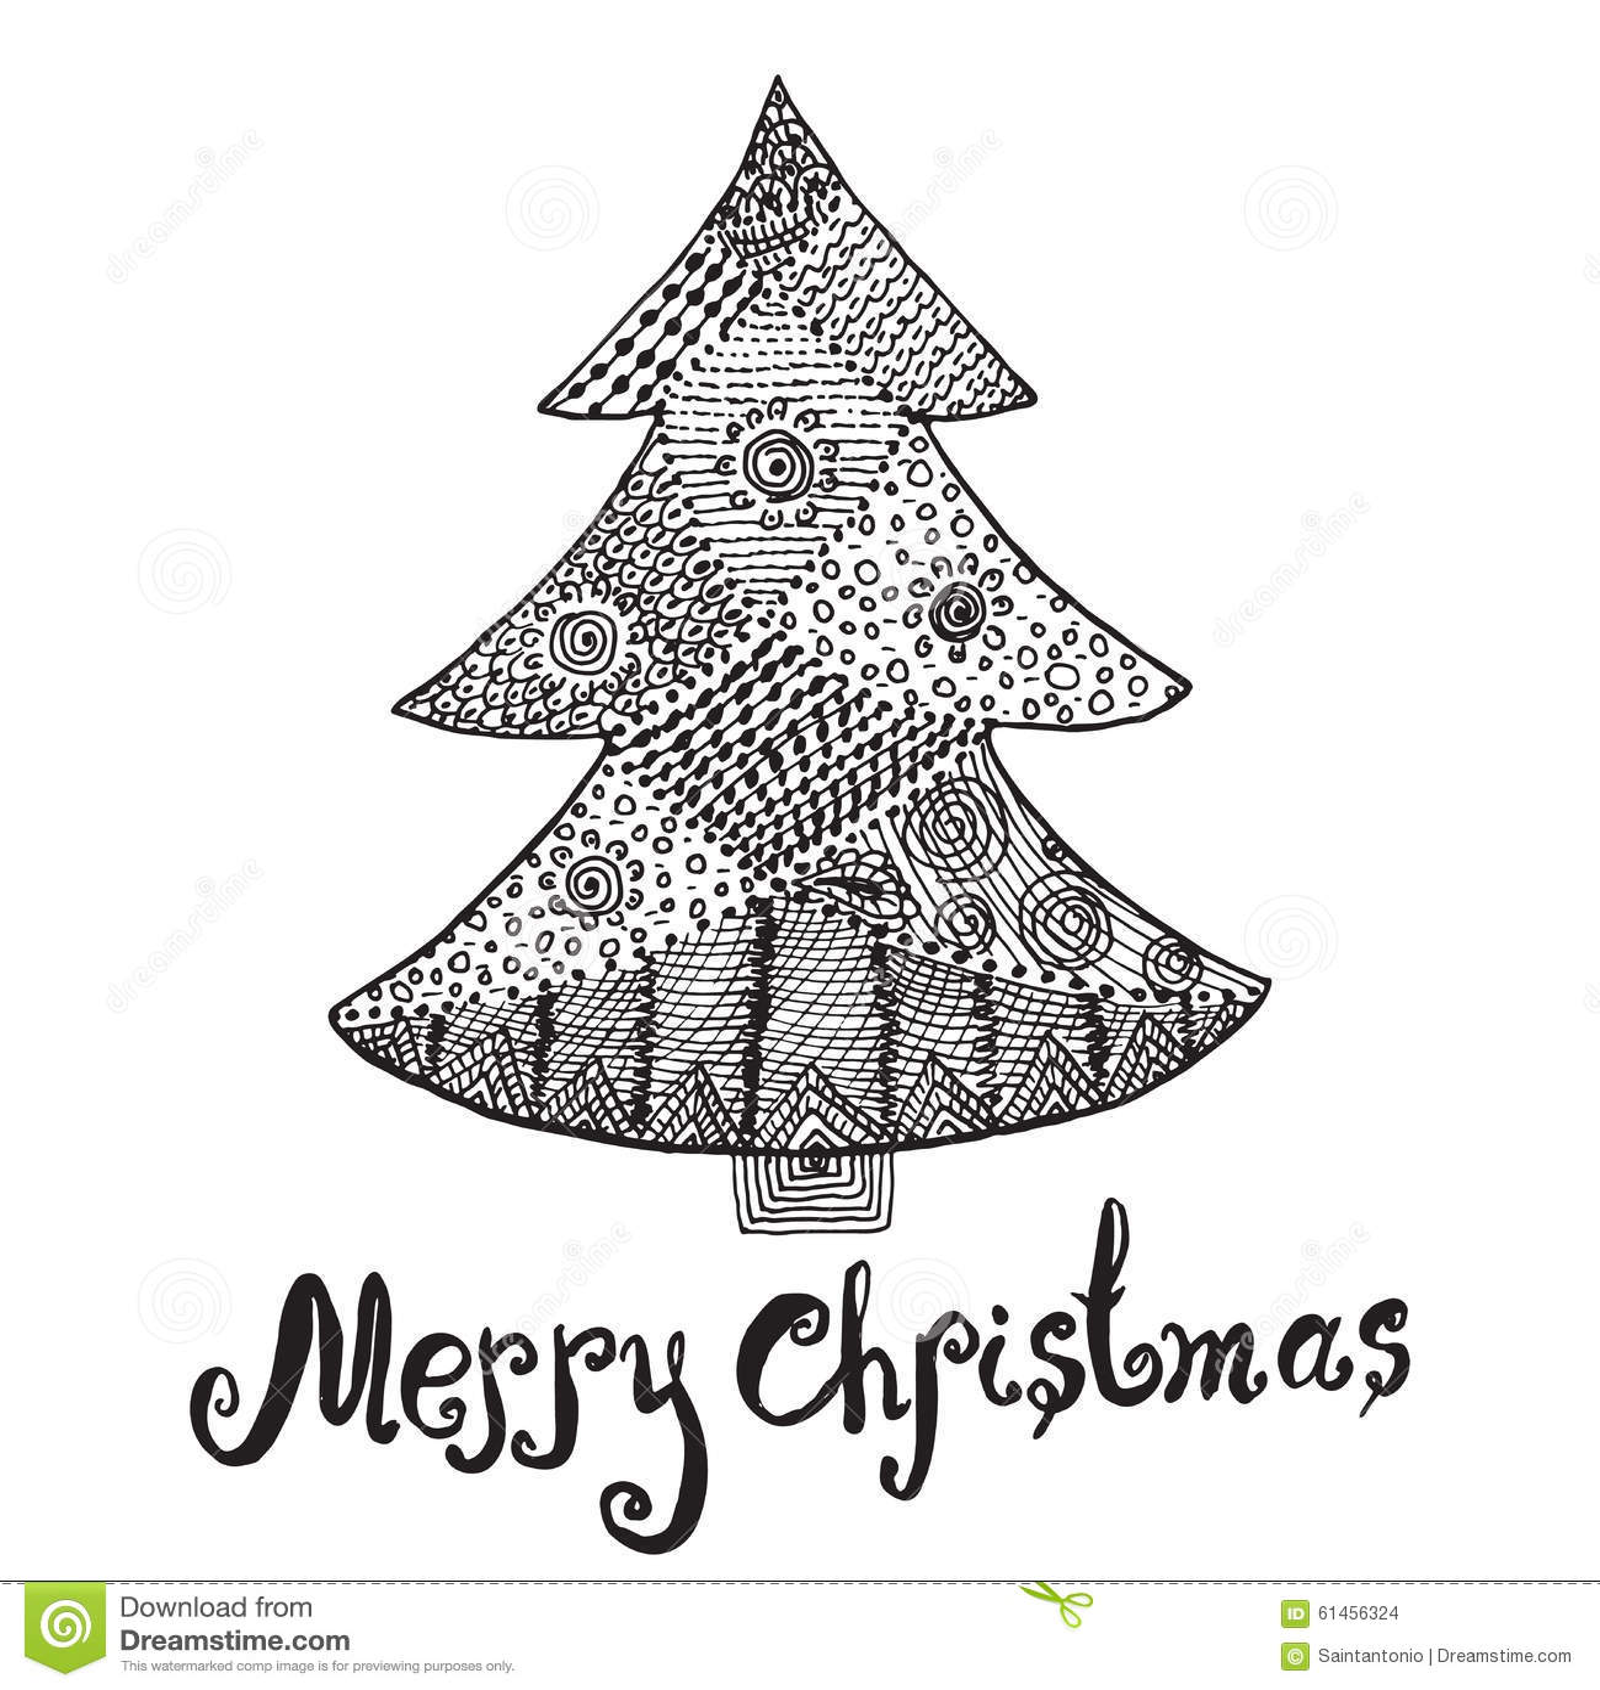 Ornamental Hand Drawn Sketch Of Christmas Tree In